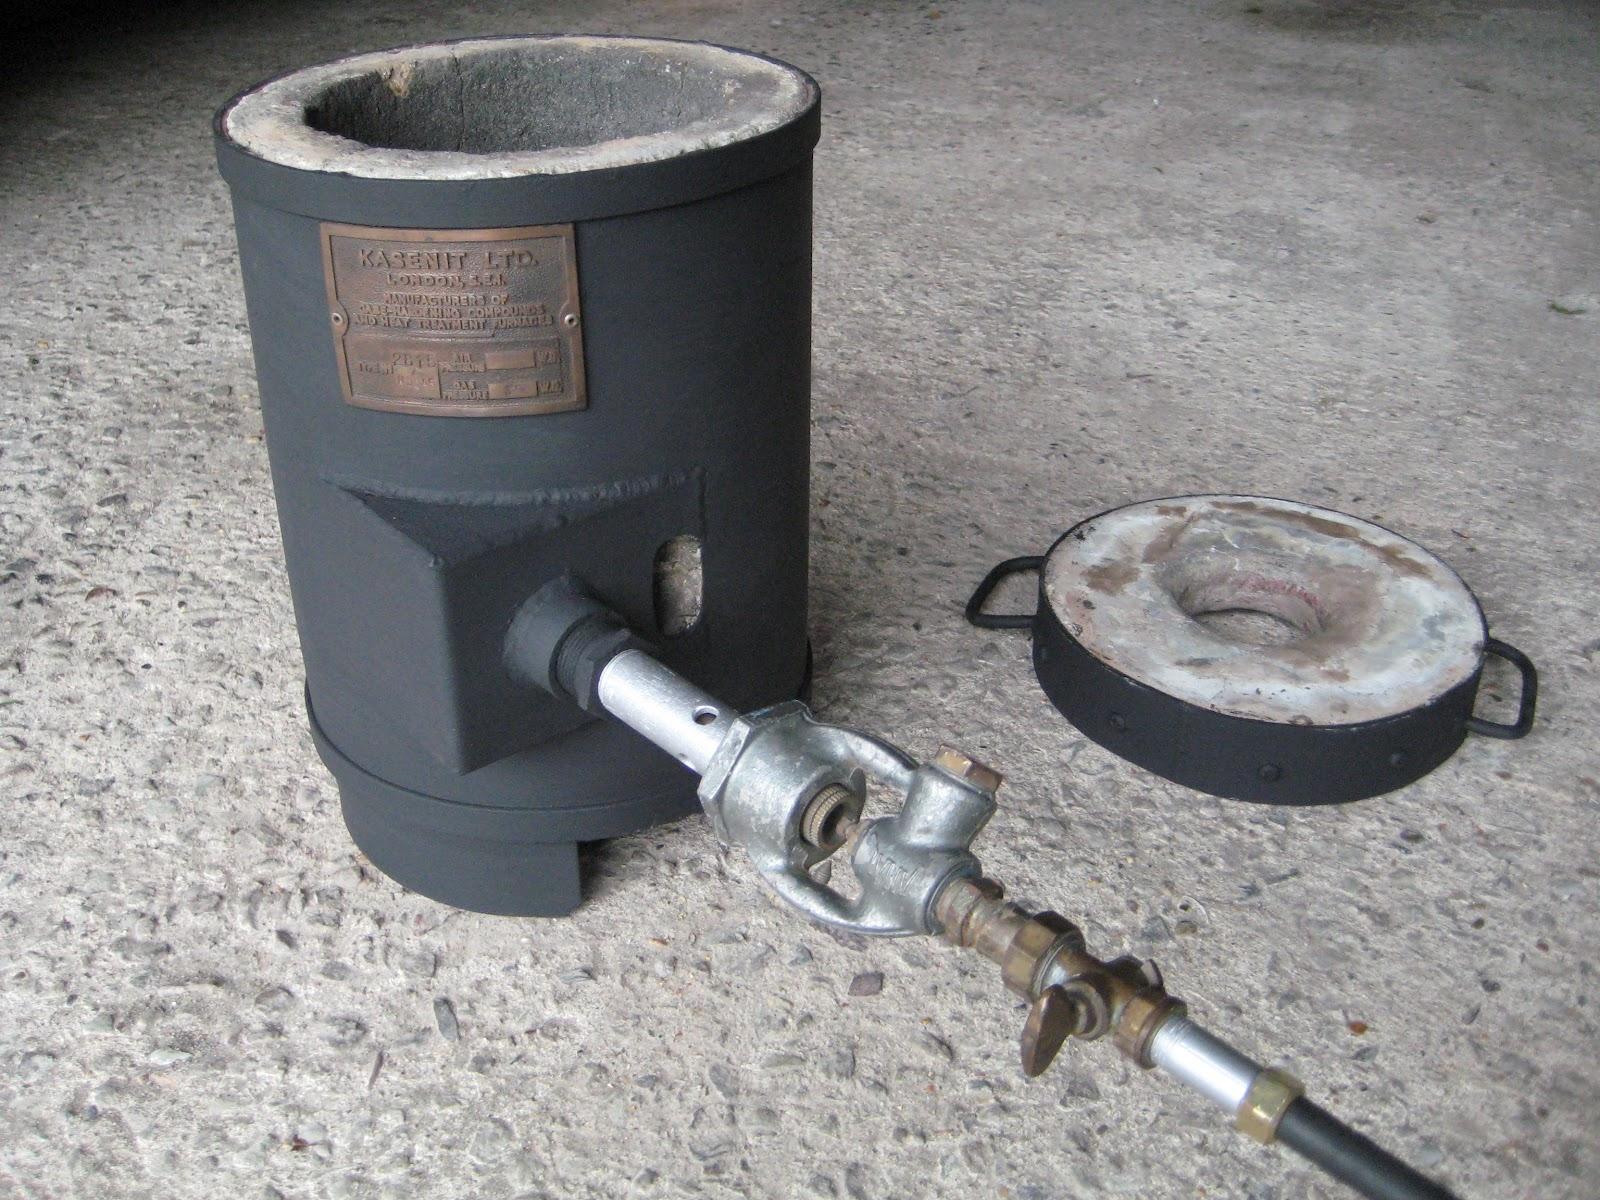 myfordboy blog and online resources: myfordboy's furnace